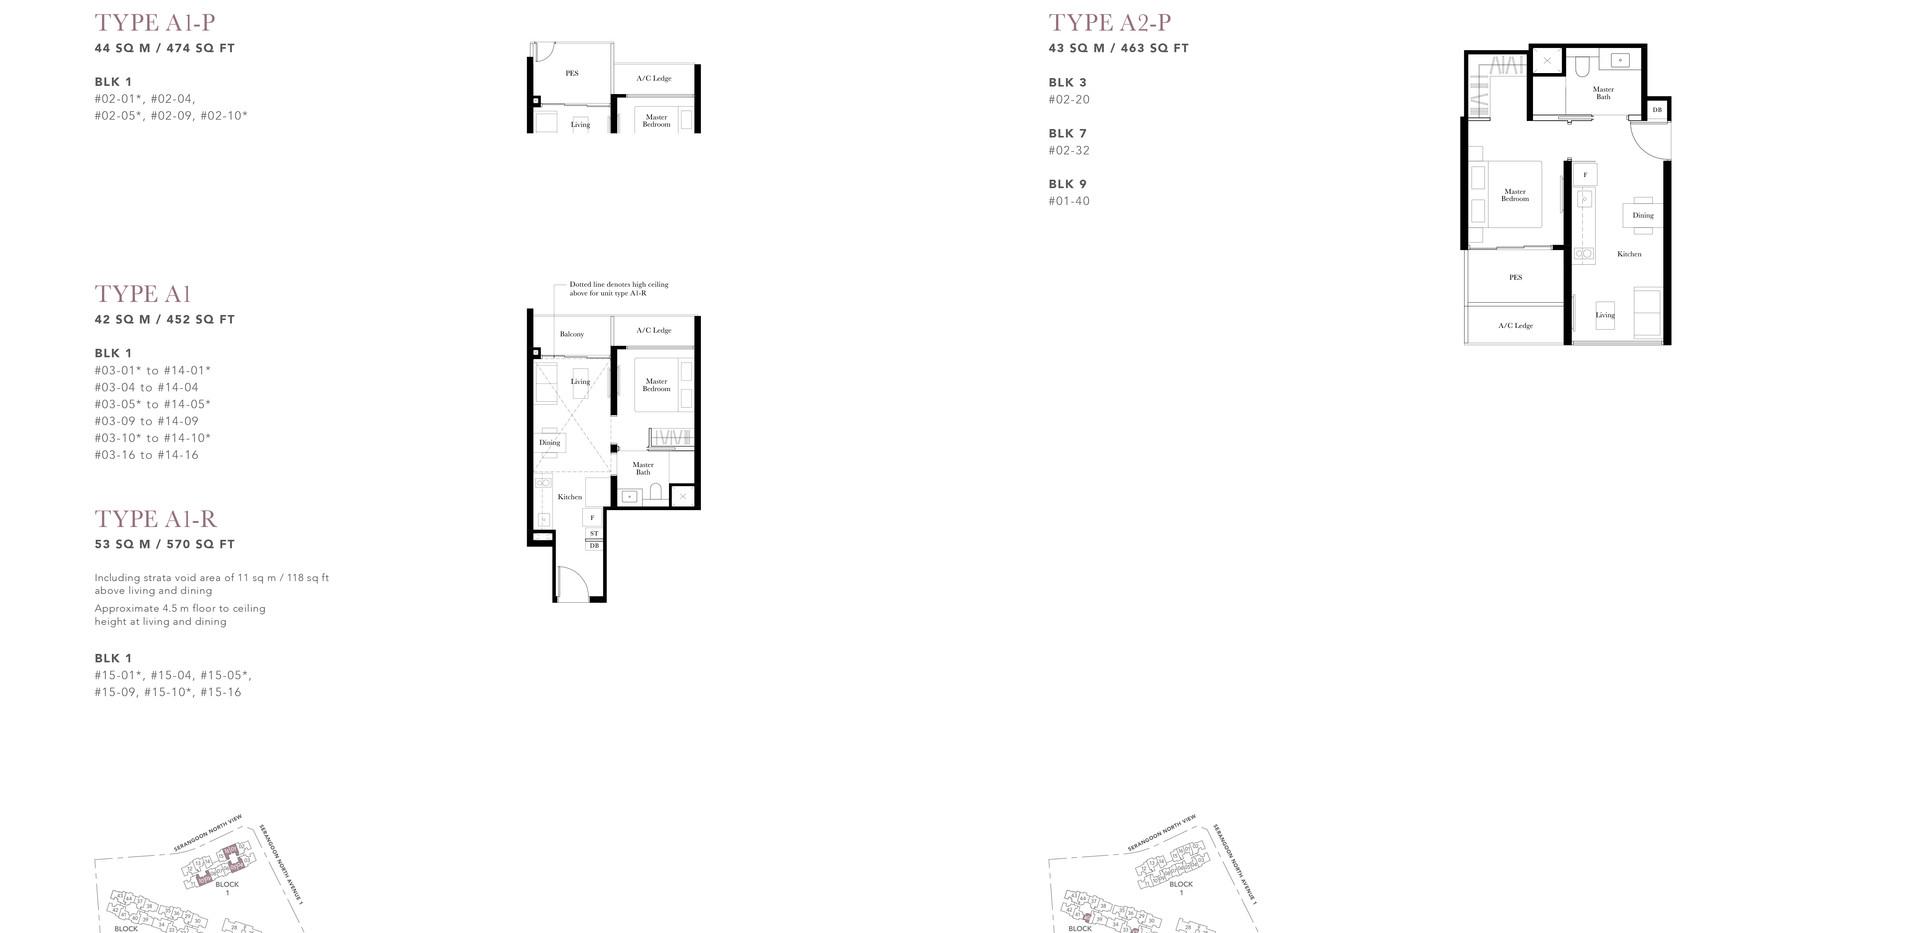 1-Bedroom_Floor Plans.jpg